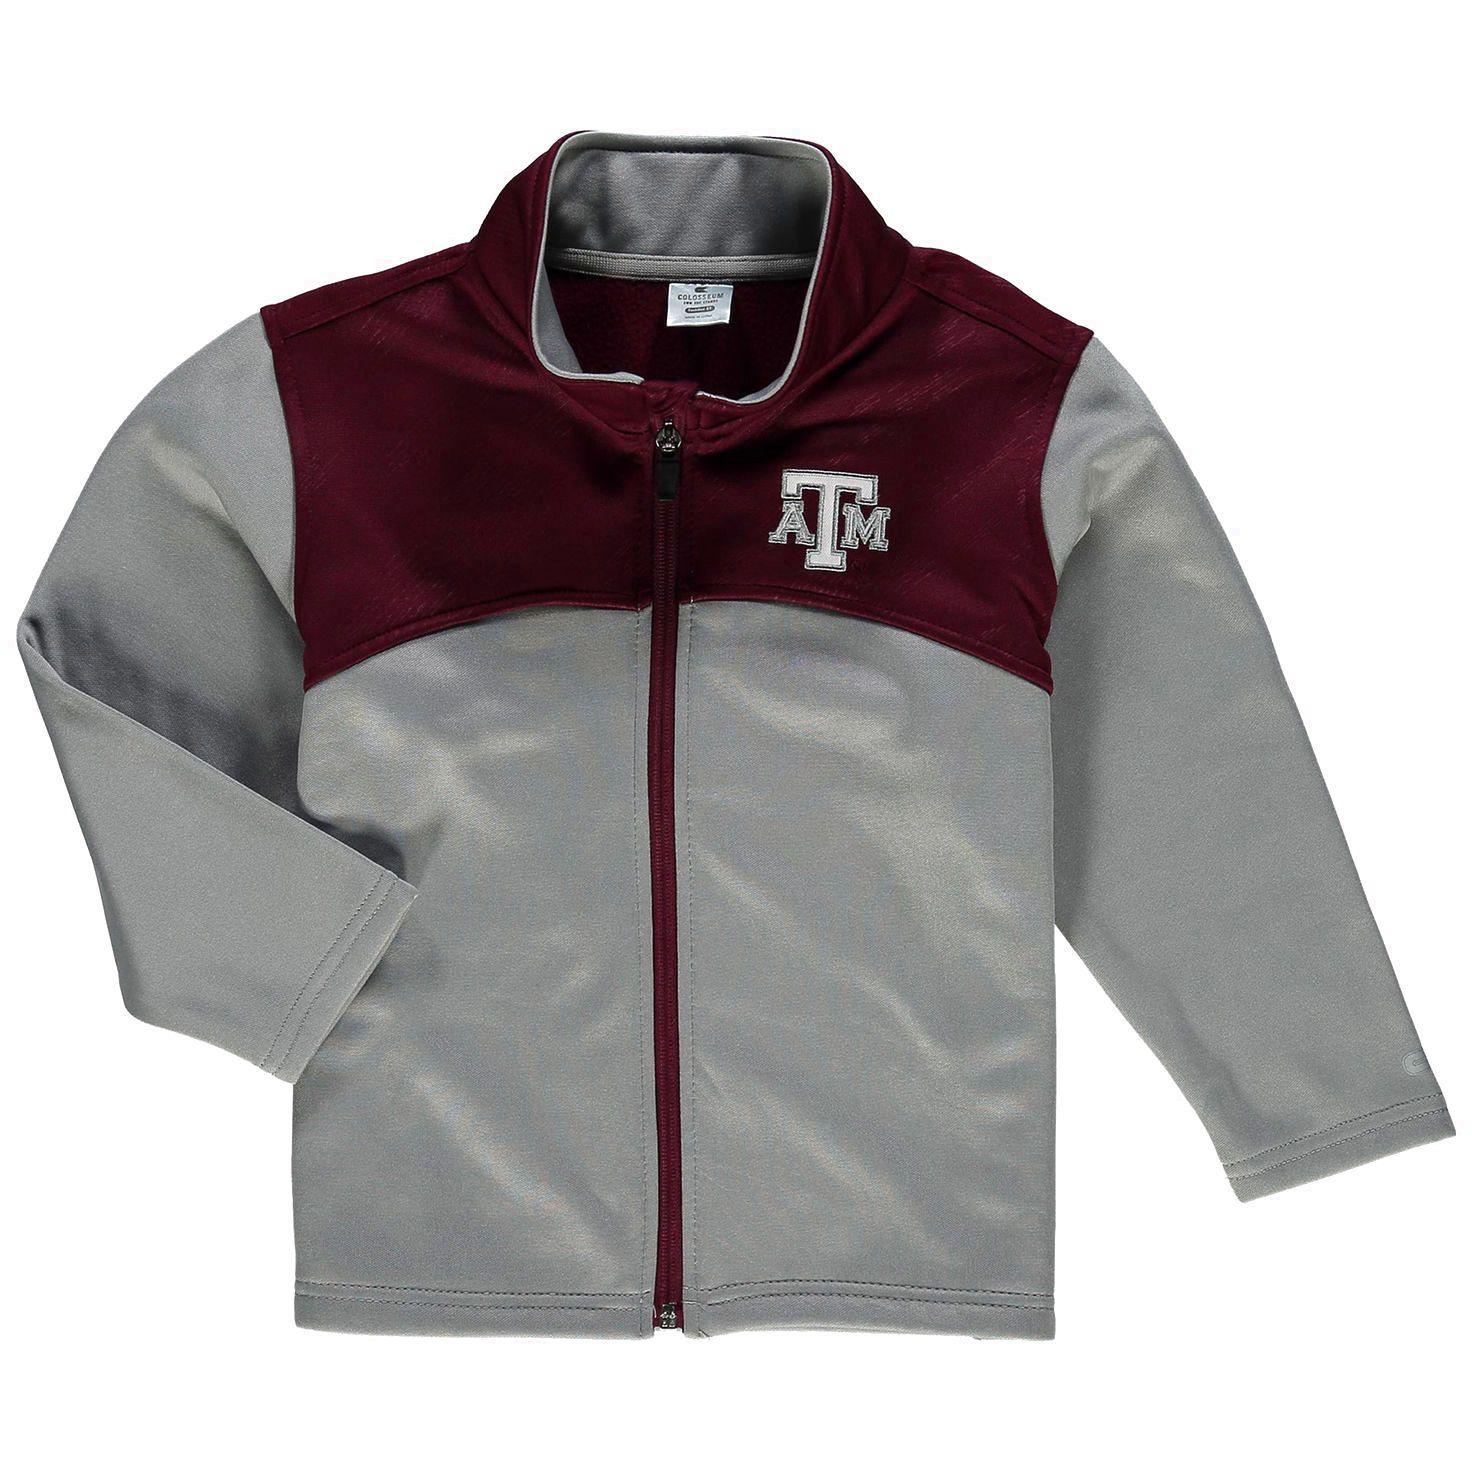 Texas A&M Aggies Colosseum Toddler Sleet Full-Zip Fleece Jacket - Gray/Maroon - $27.99